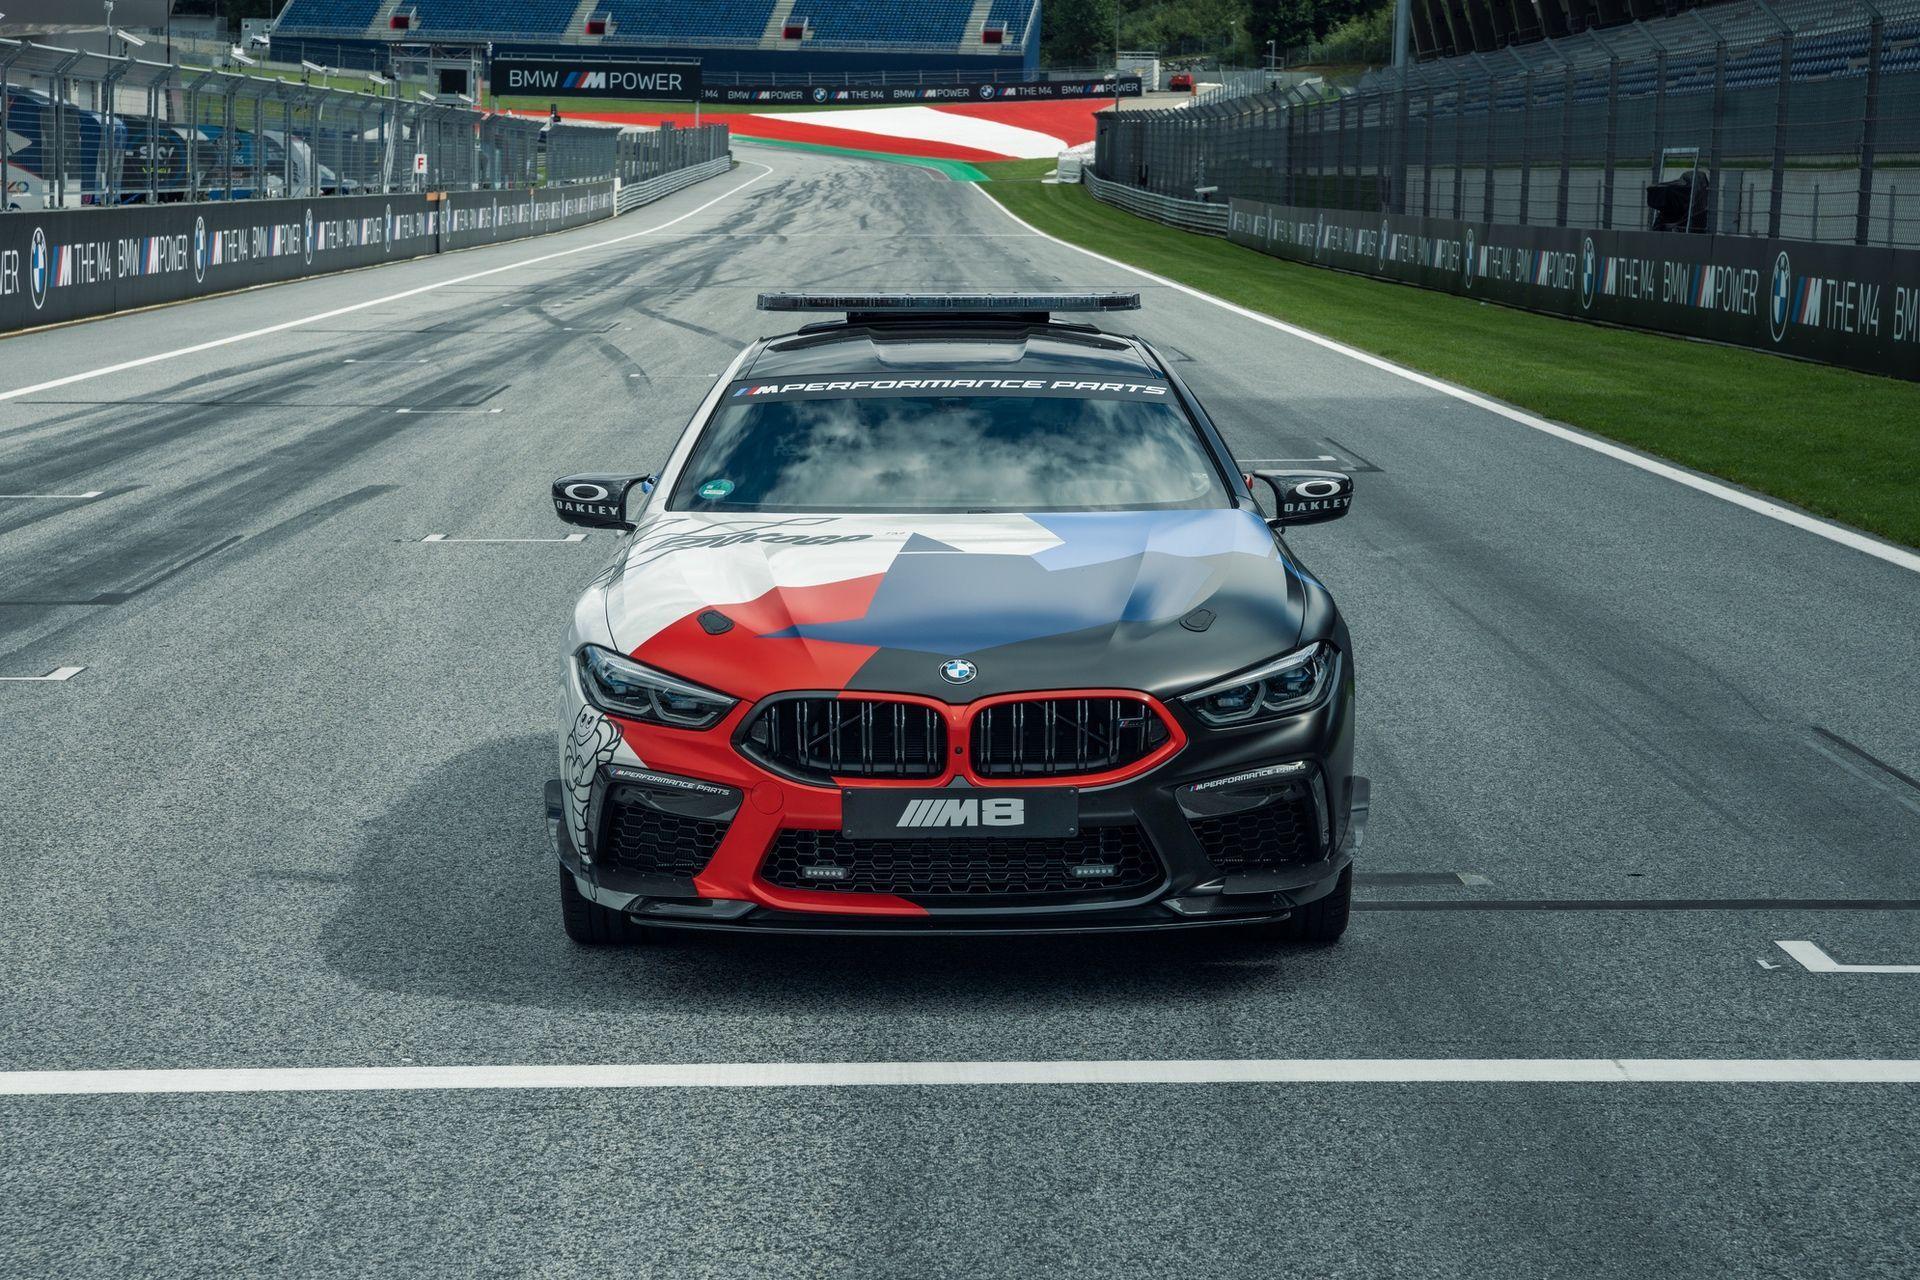 BMW_M8_Gran_Coupe_Safety_Car_MotoGP_0014